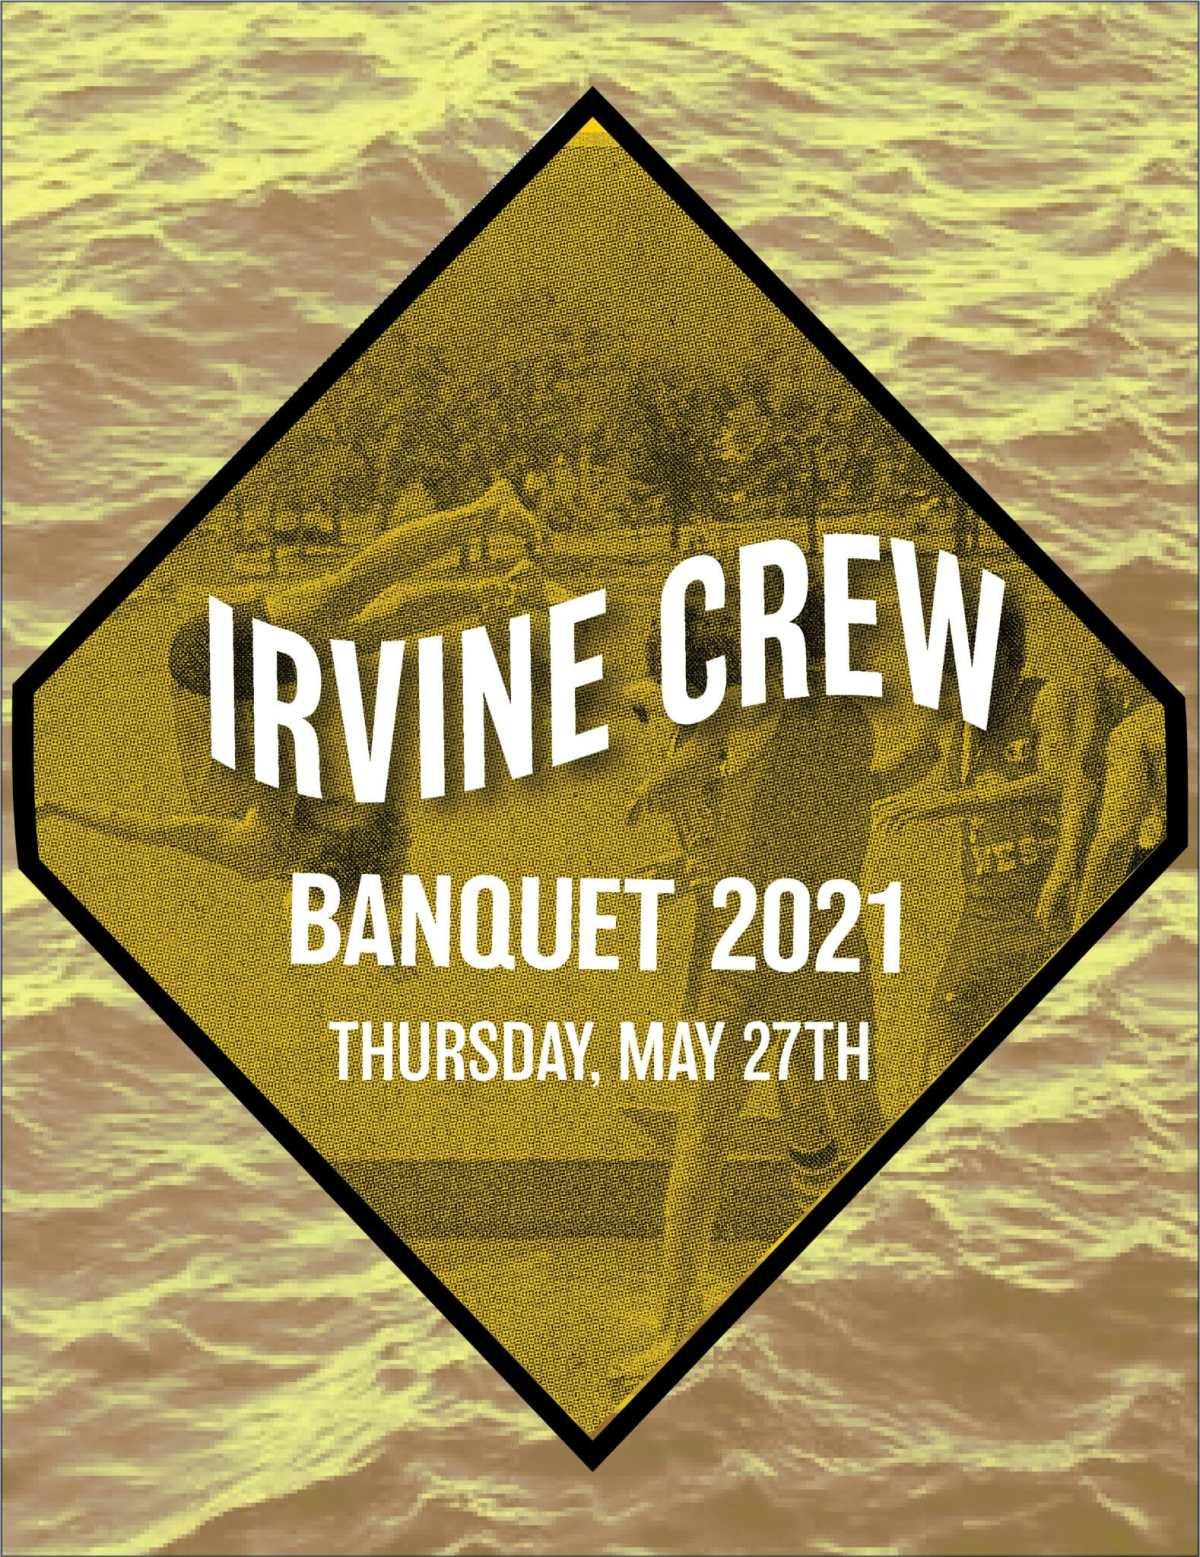 IRVINE CREW BANQUET 2021